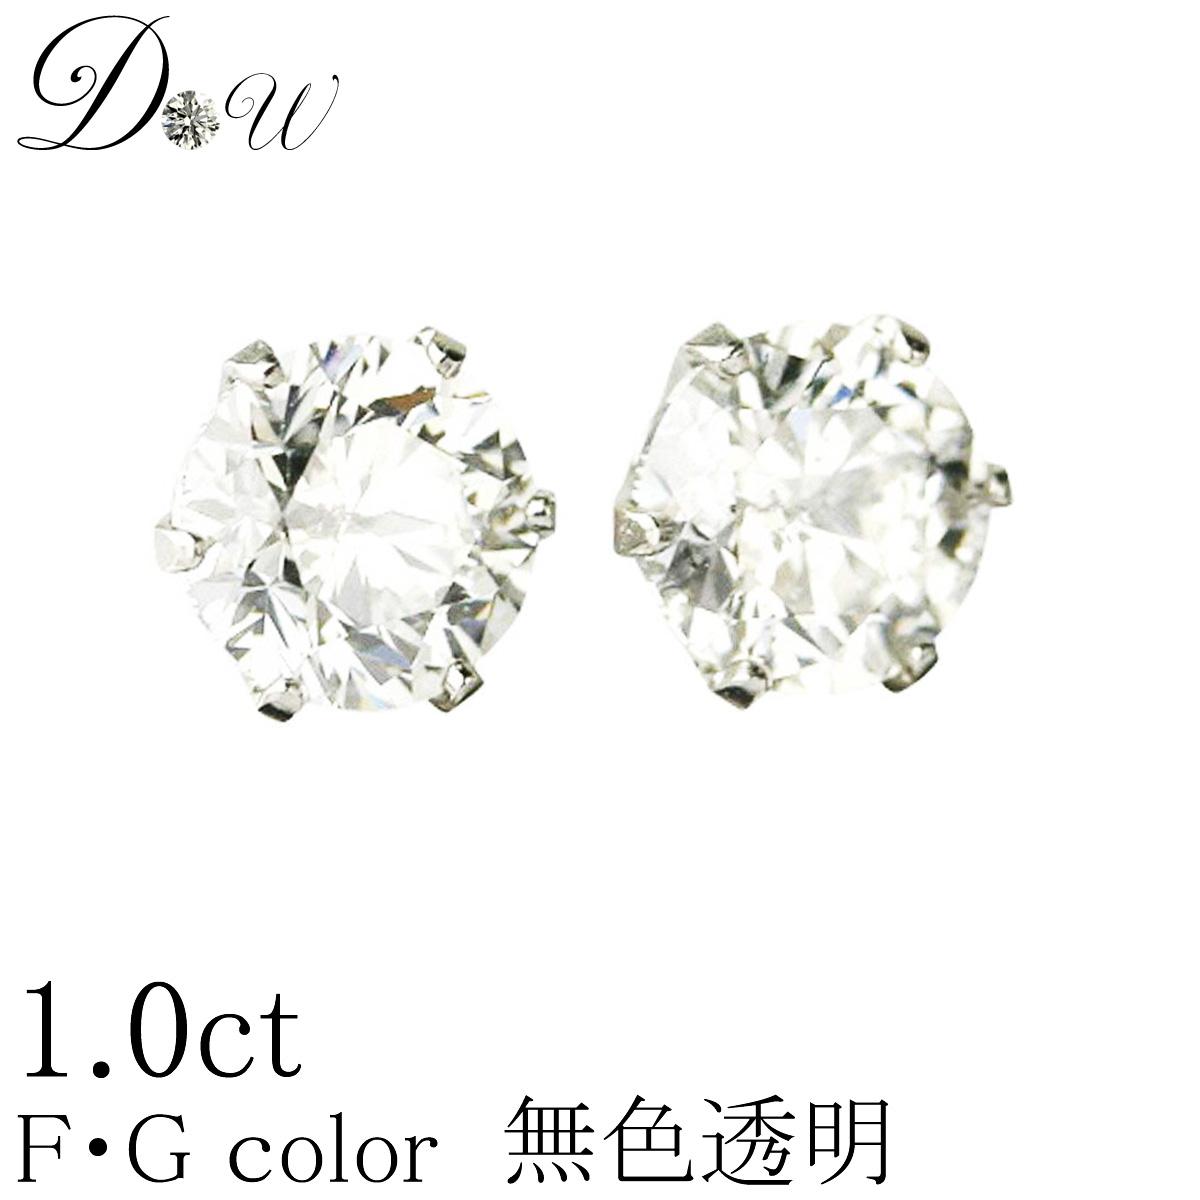 80cb02edd6e4a Total one 0.50ct X 0.50ct 1.0ct diamond pierced earrings one platinum for  PT 900 natural diamond pierced earrings 1.0ct both ears in total